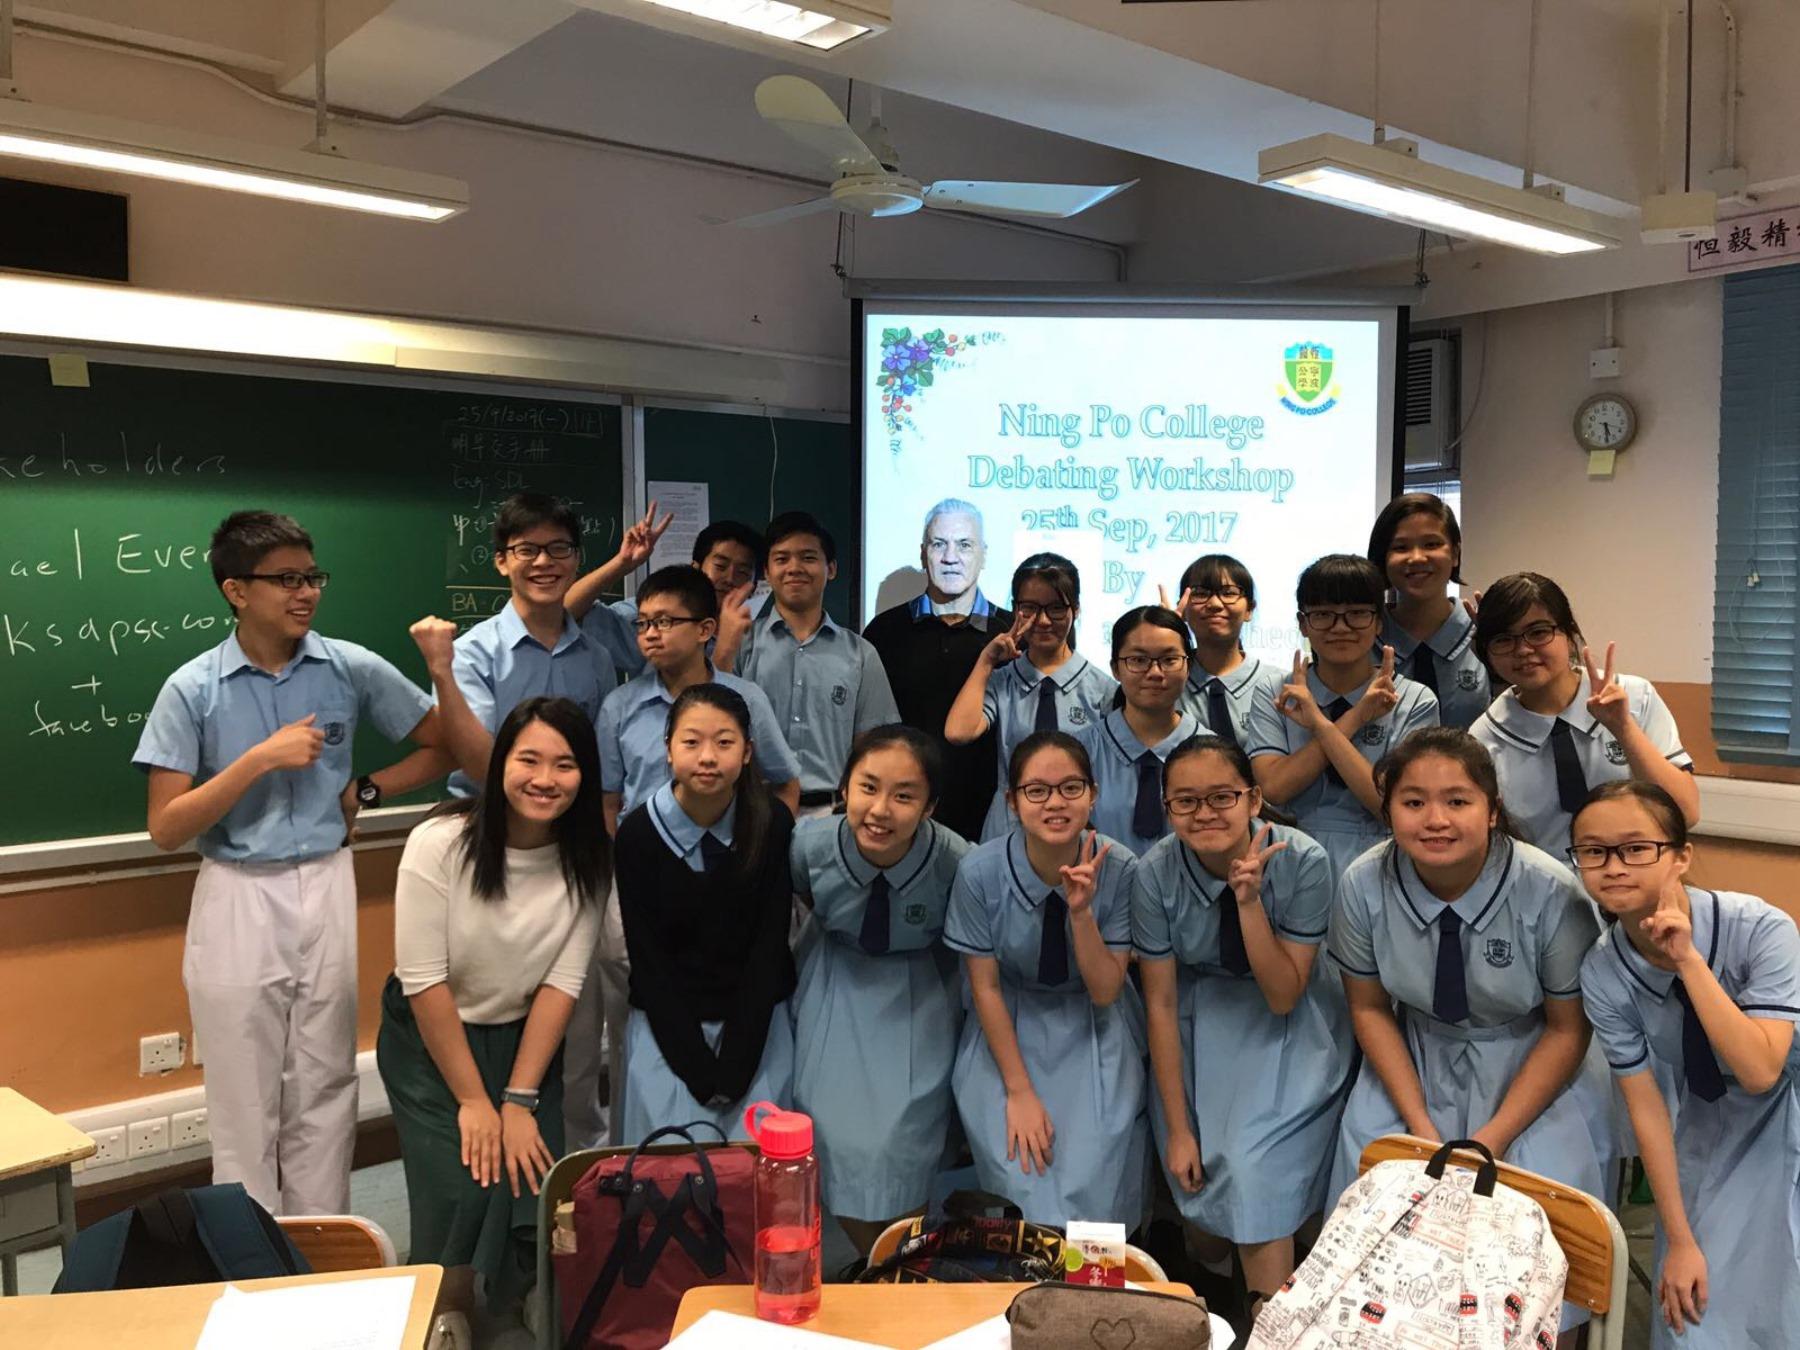 http://npc.edu.hk/sites/default/files/img_2934.jpg